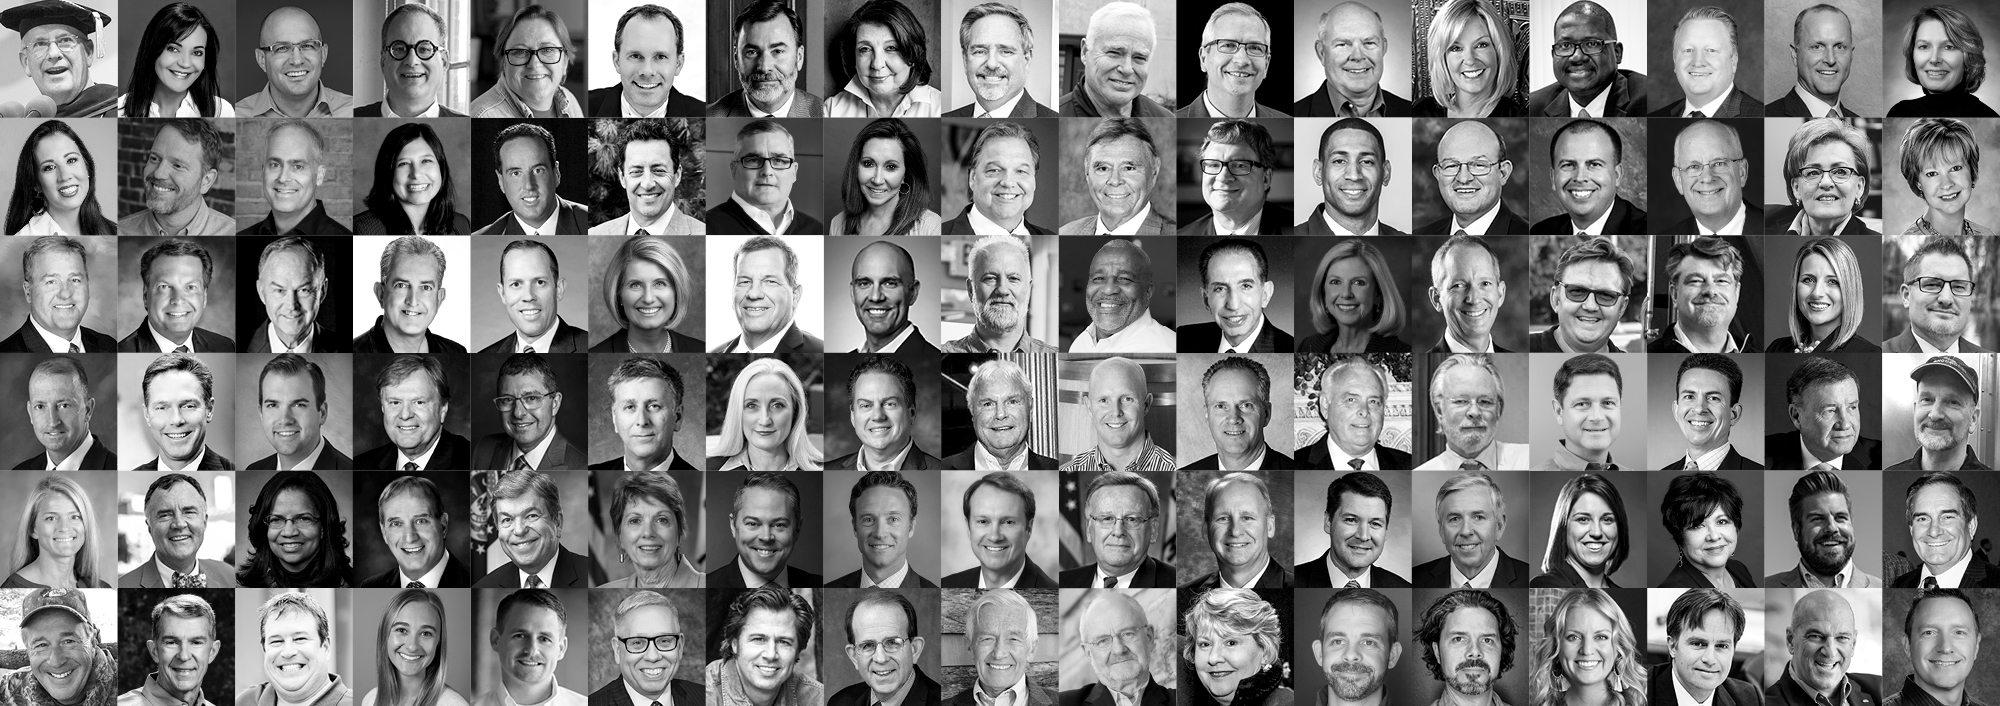 Biz 100: The Top Business Leaders in Southwest Missouri